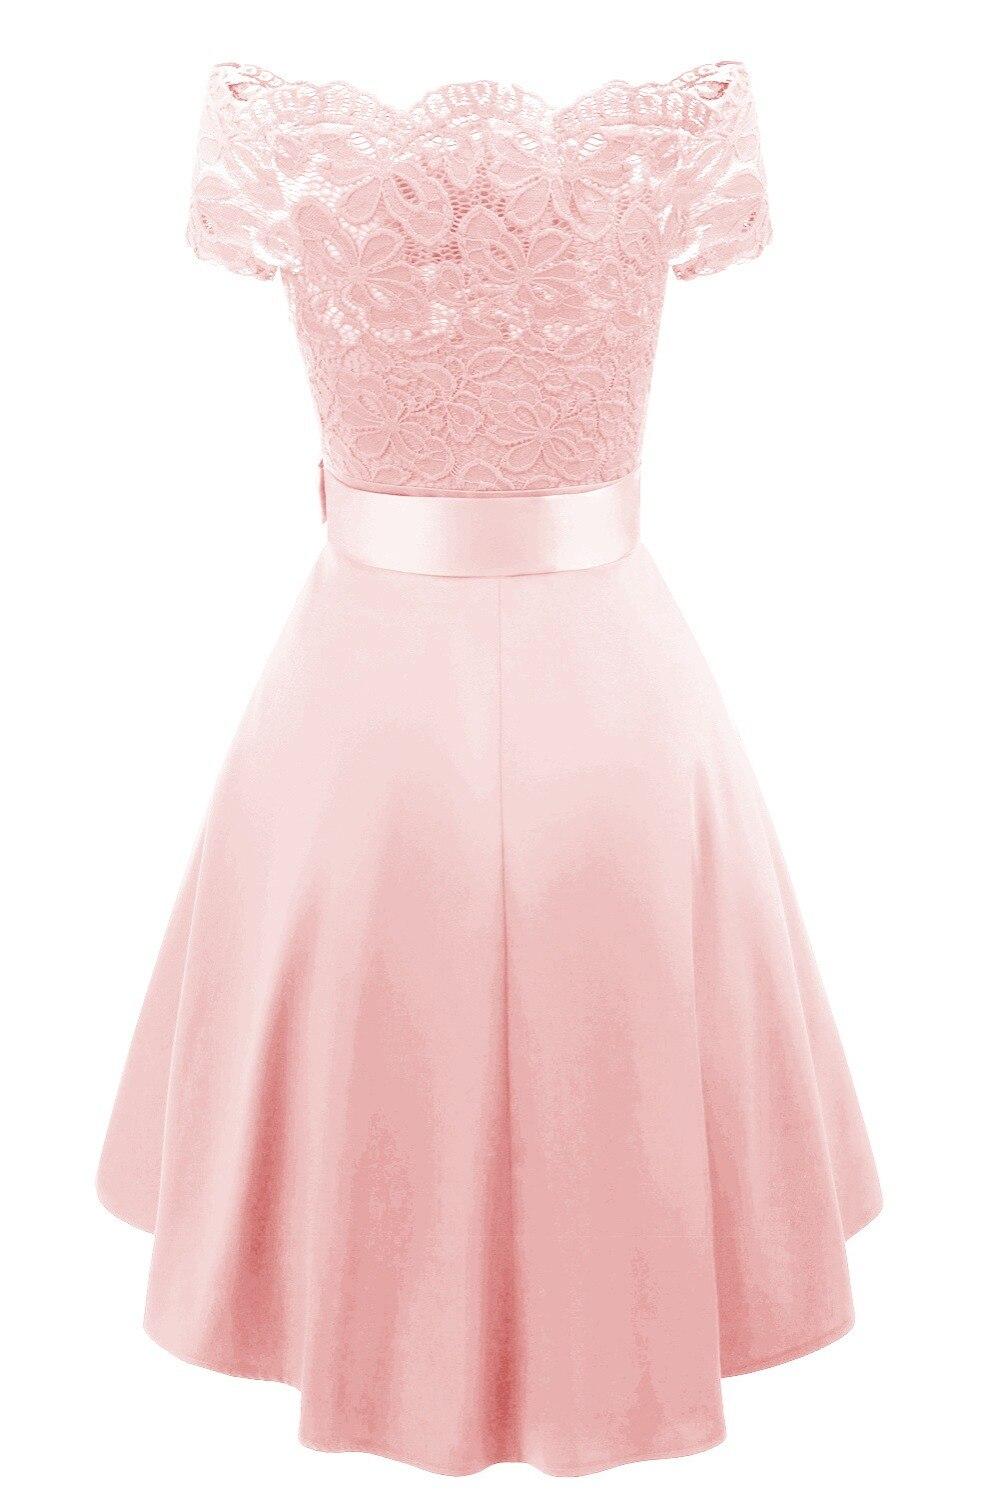 Cocktail Dresses Simple A-Line lace Elegant Summer Women 2019 Short Vestidos Off the Shoulder Sexy Women Cocktail Dresses